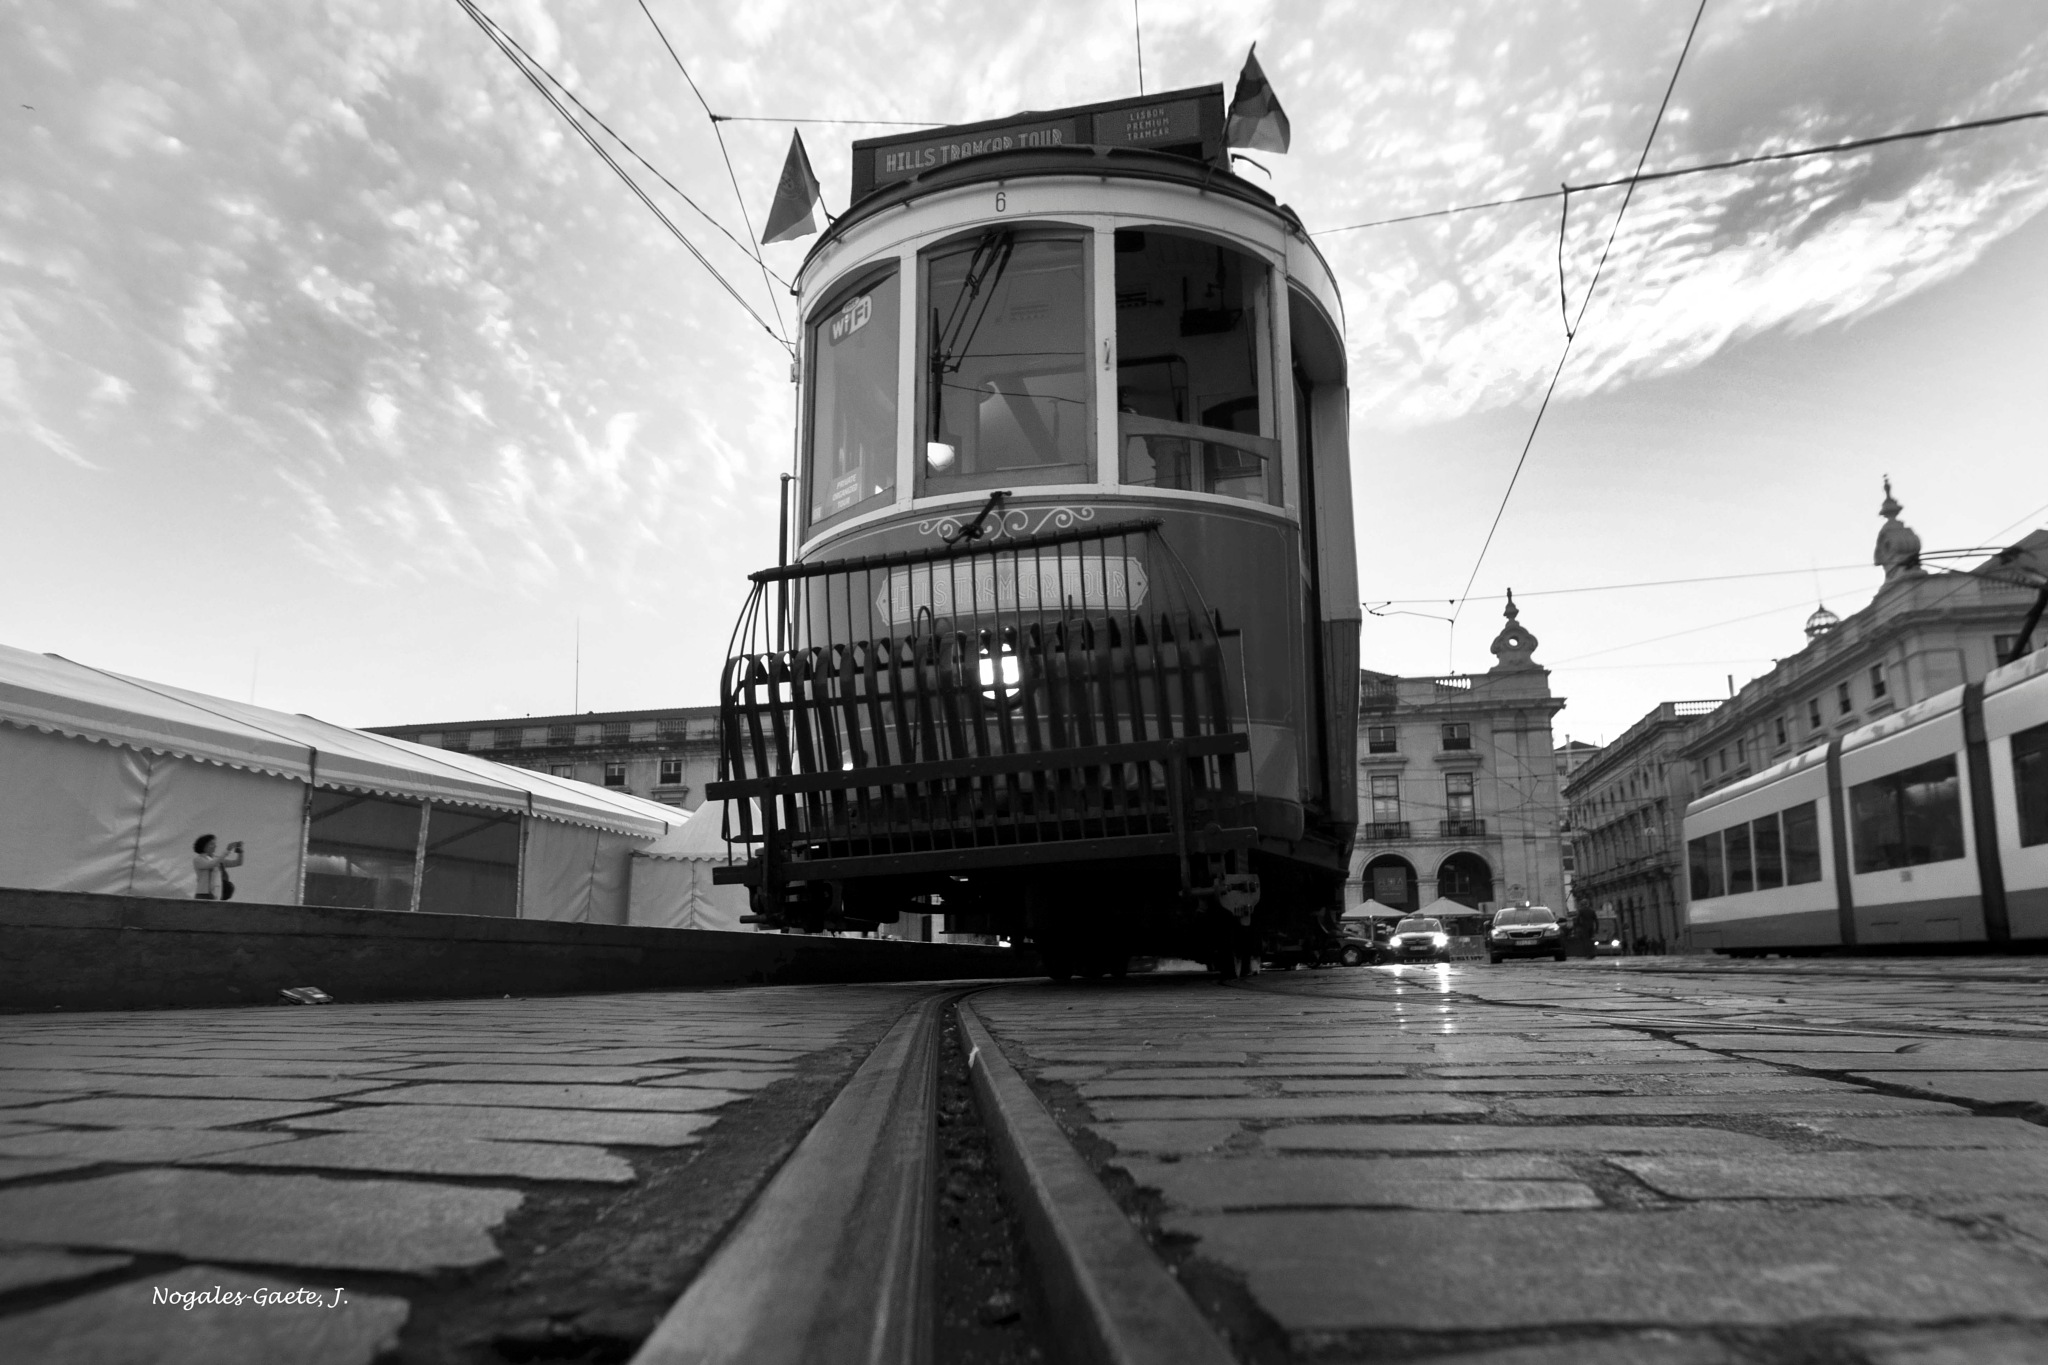 Lisboa by Jorge Nogales